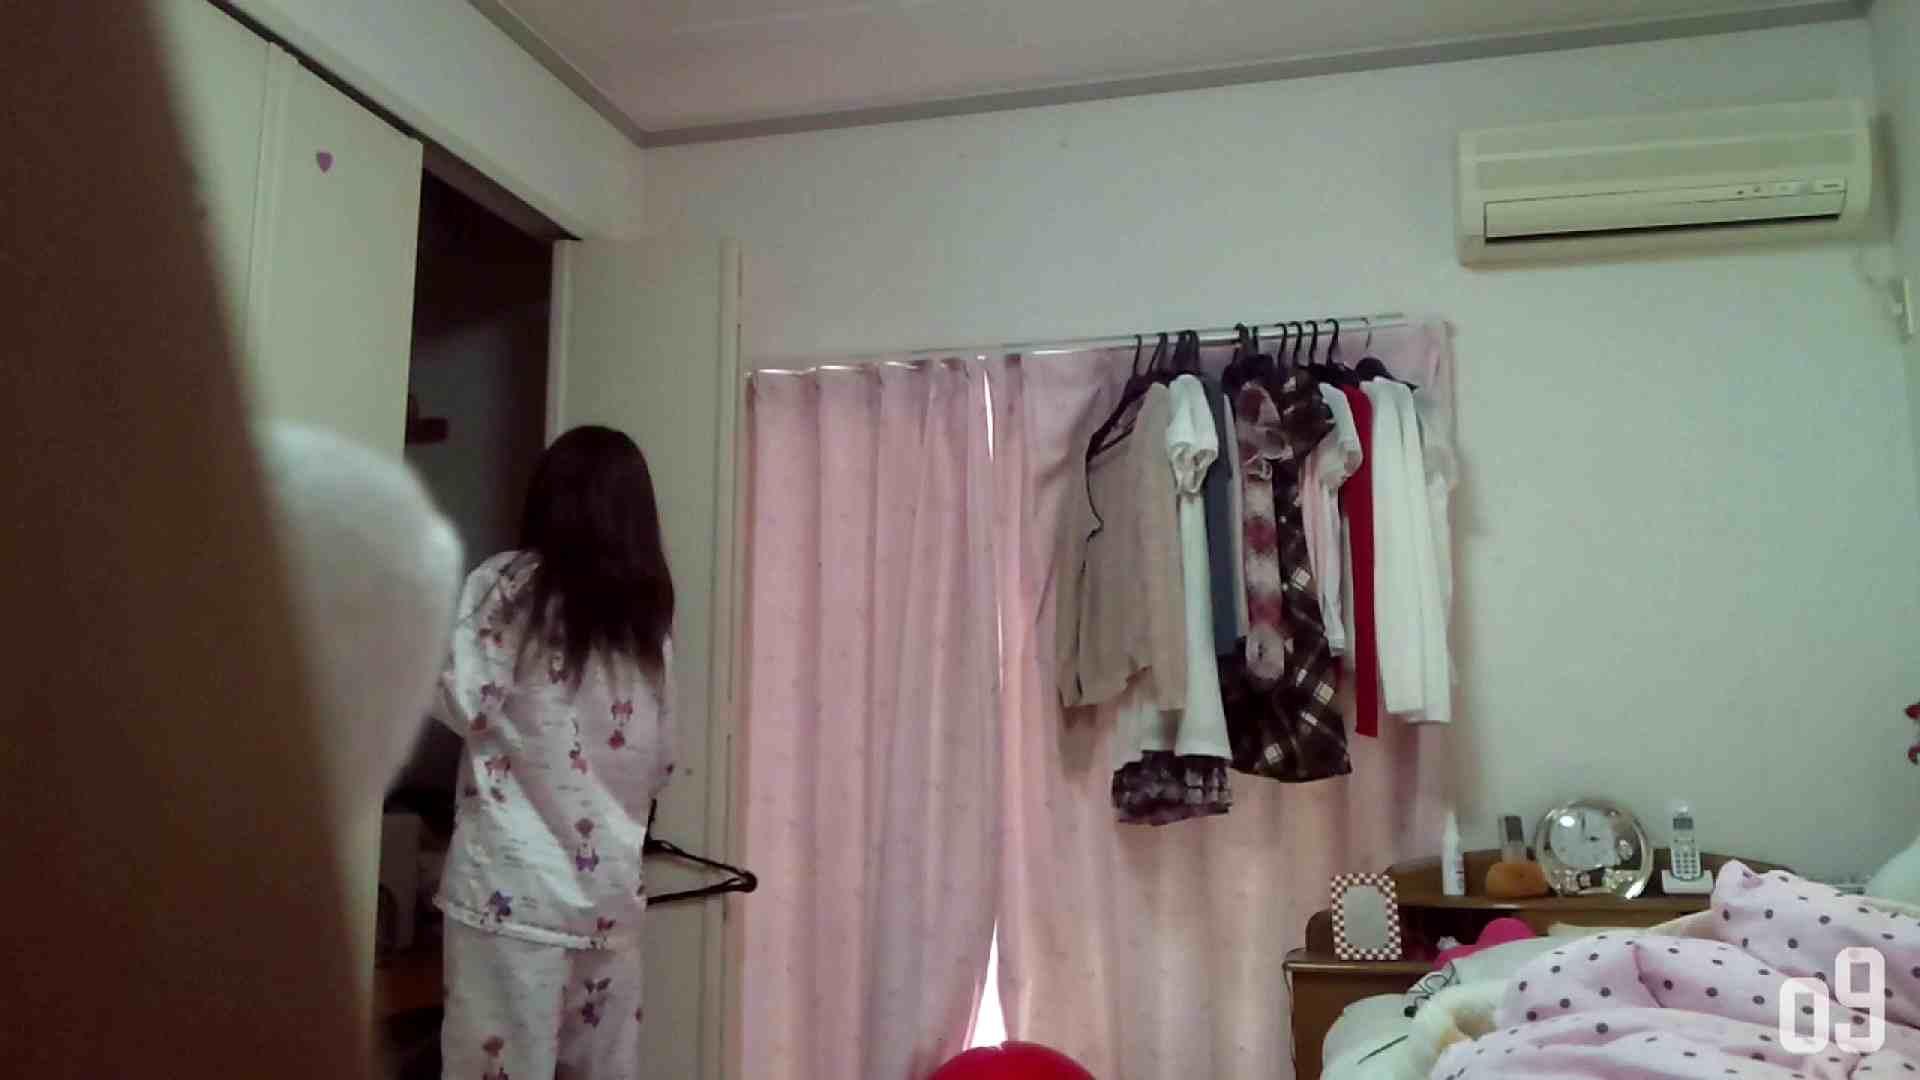 vol.2 瑞希ちゃんの自宅公開!寝起きの着替え・・・ラリルそー OLヌード天国  94PIX 16